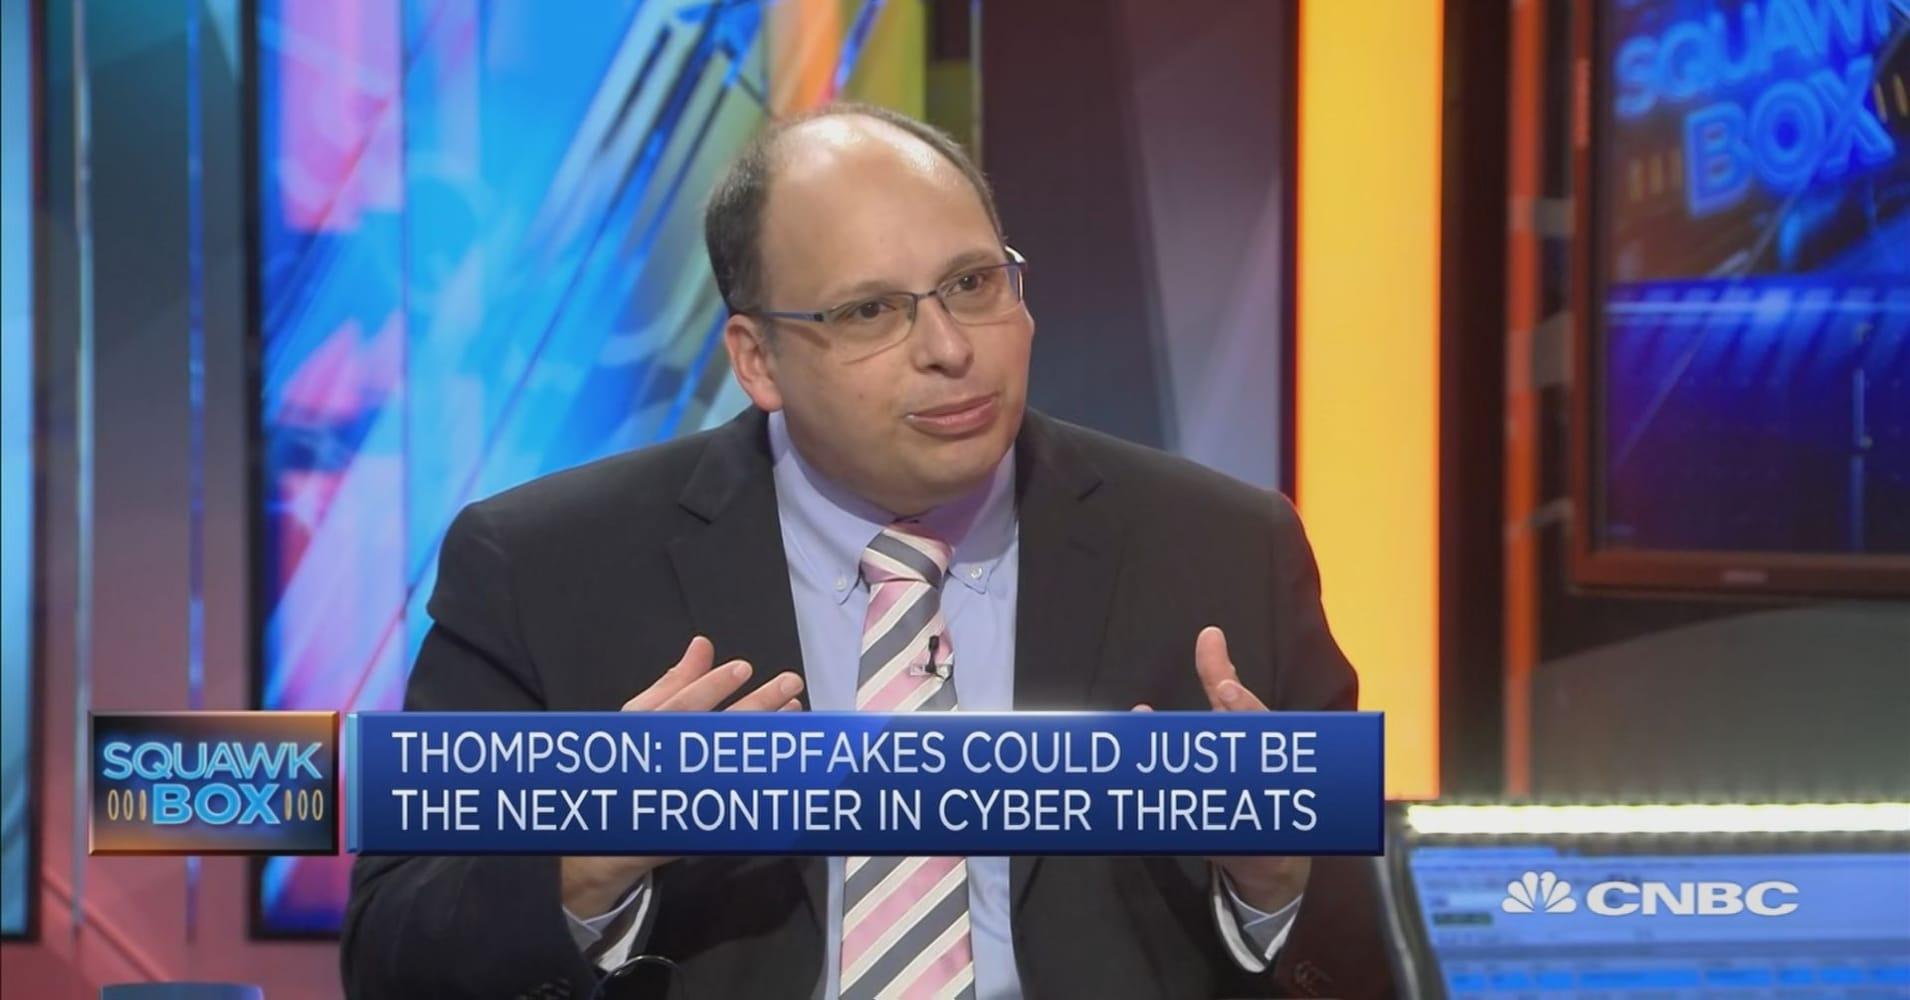 Symantec discusses the financial implications of deepfakes